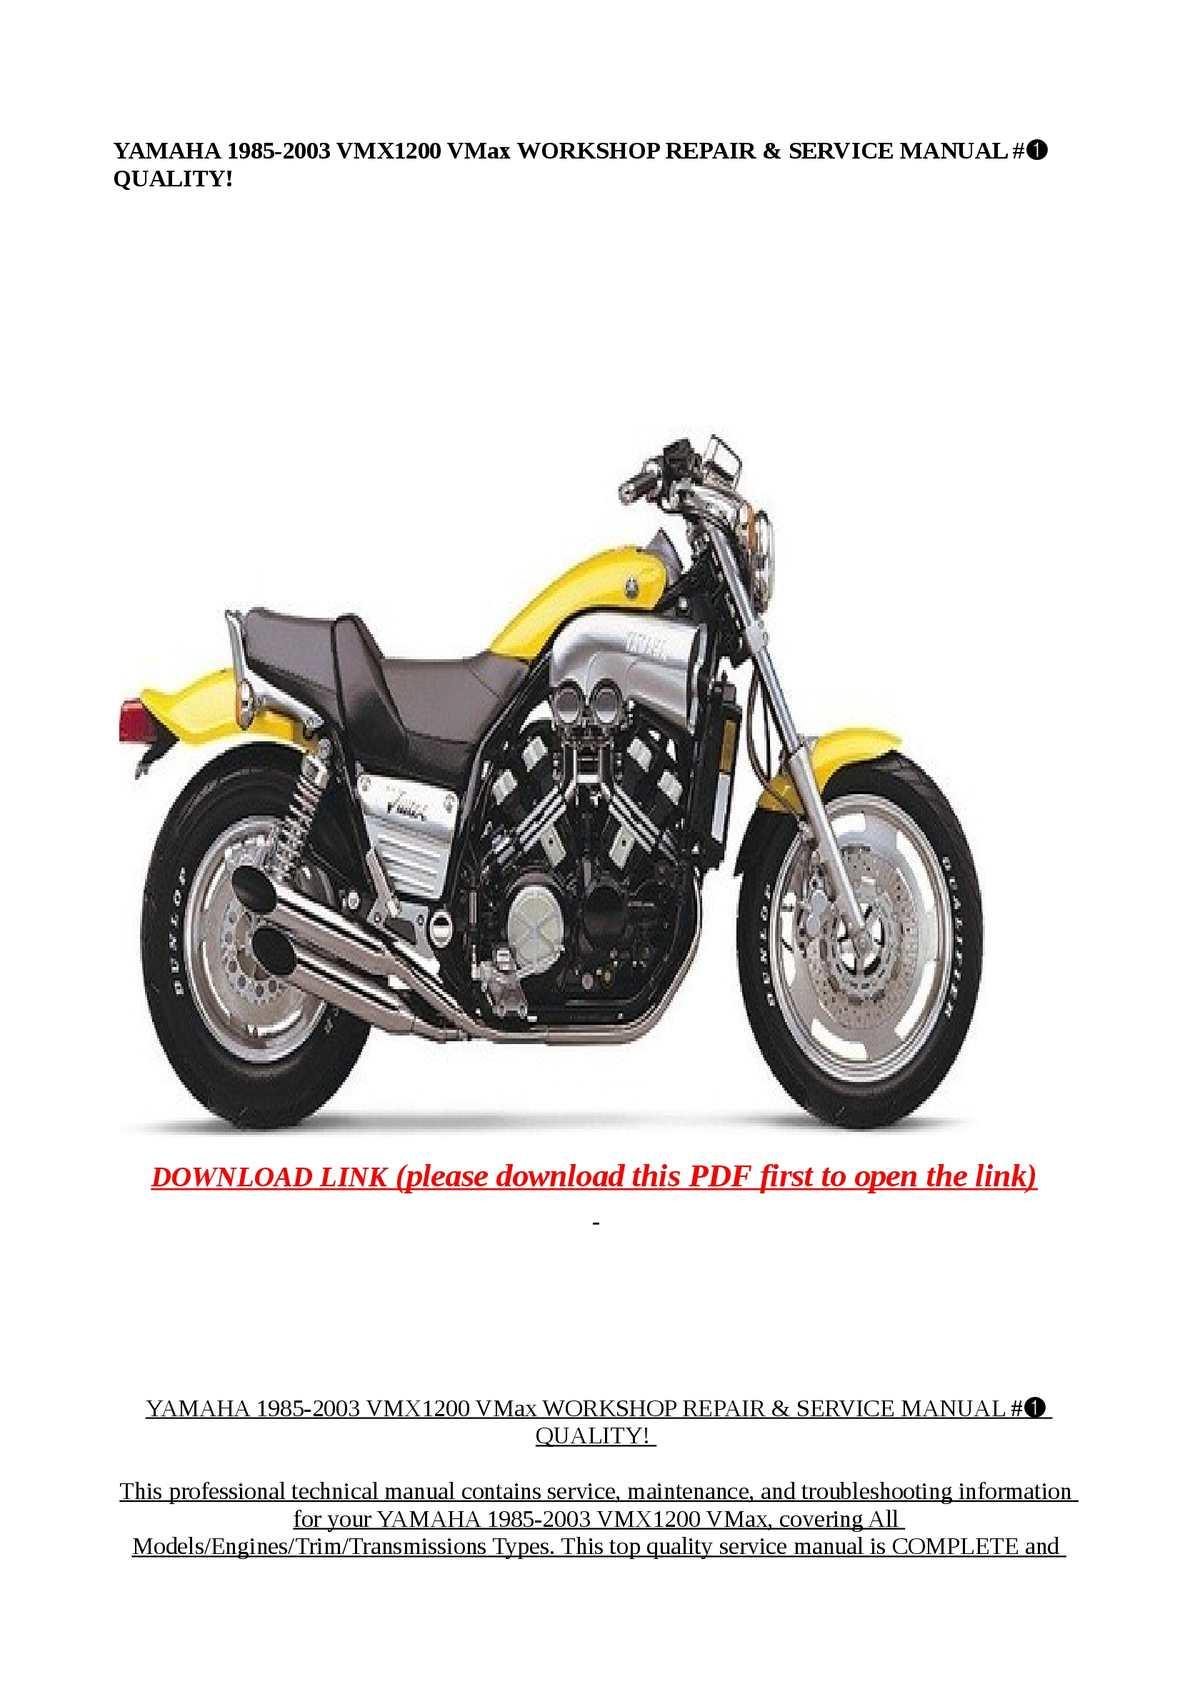 Calamo Yamaha 1985 2003 Vmx1200 Vmax Workshop Repa Engine Diagram